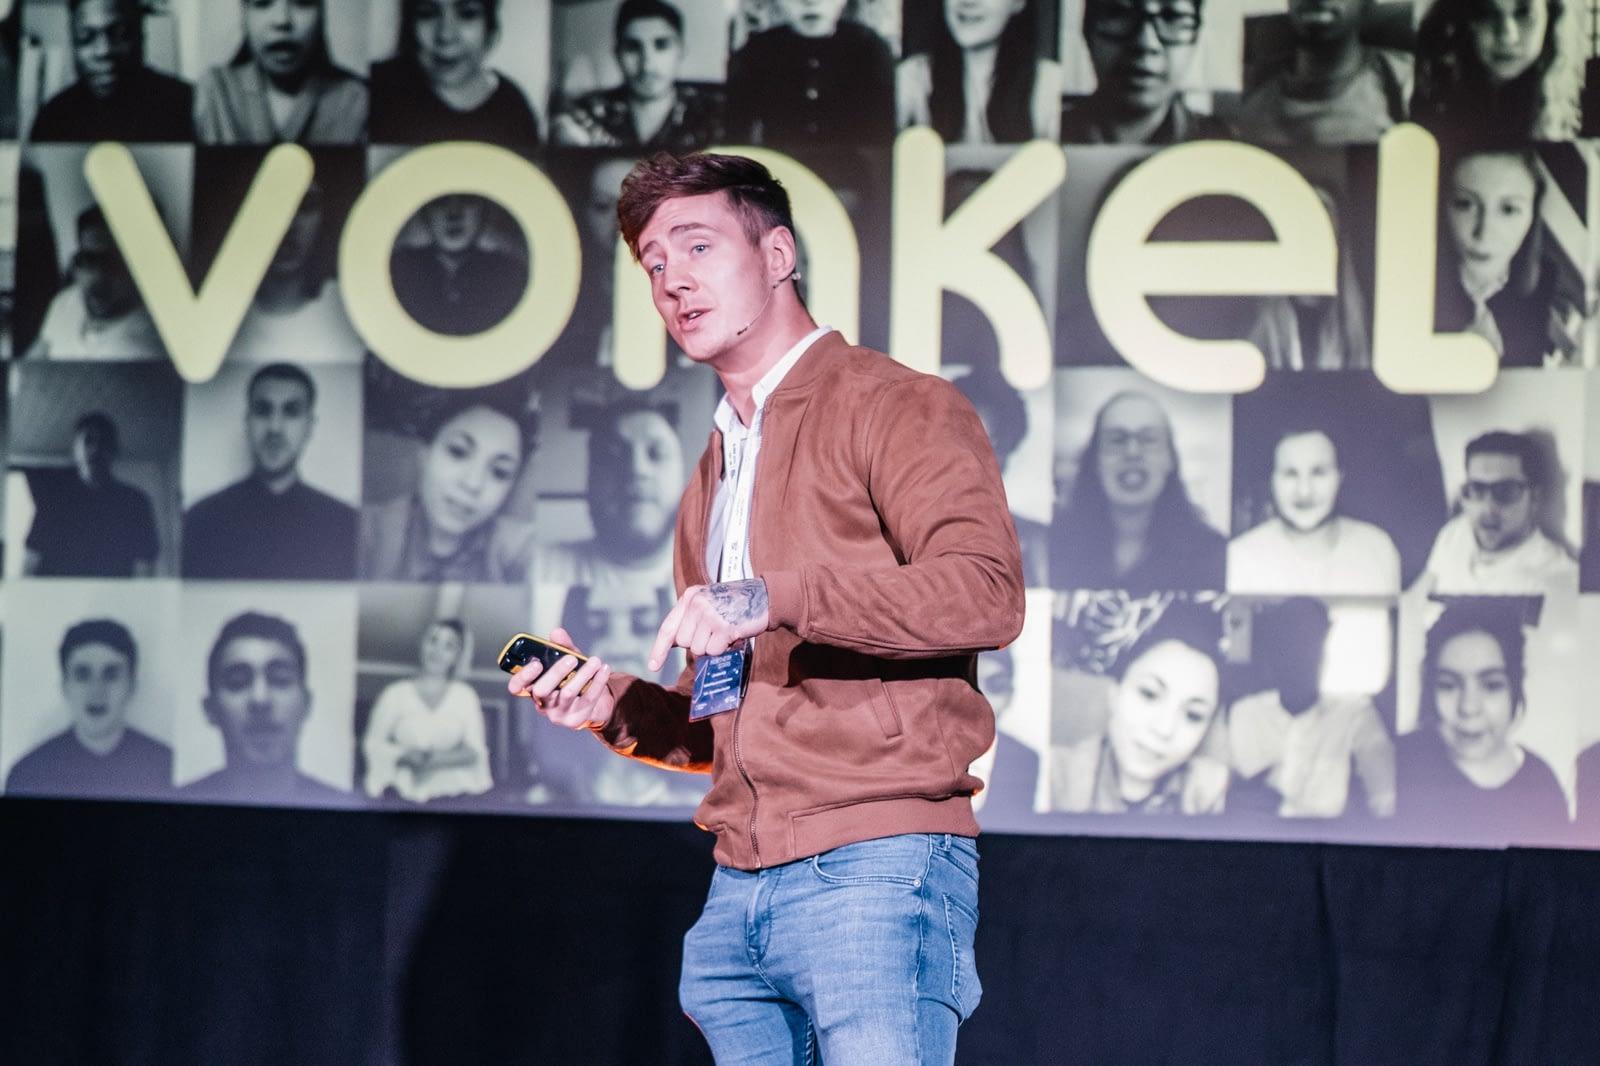 Vonkel startup post-mortem